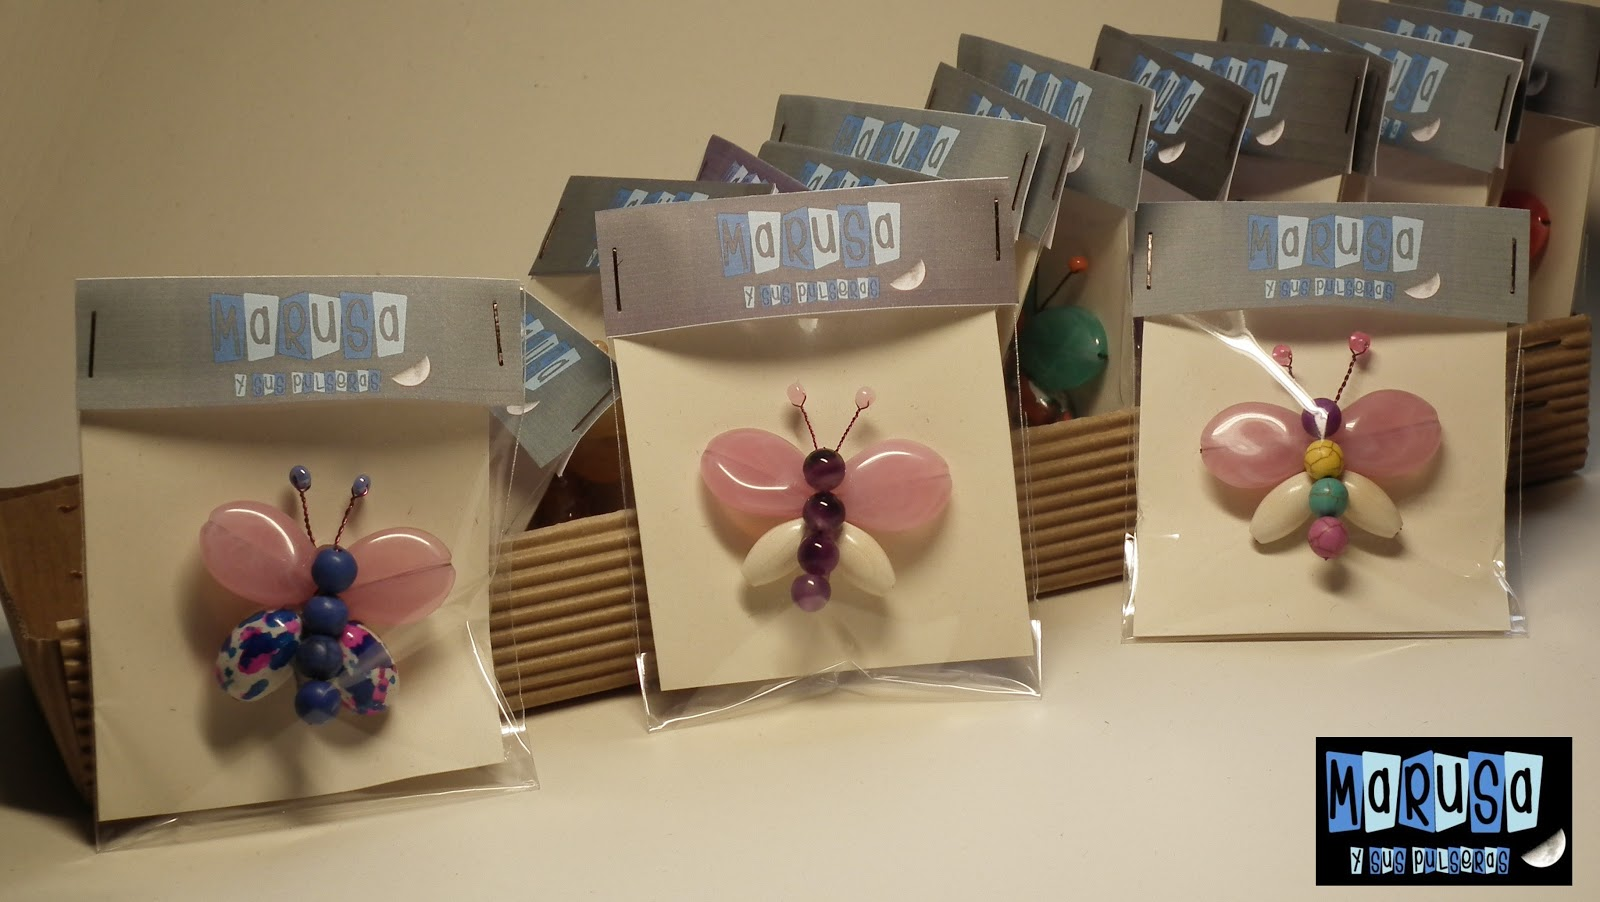 broche marusa mariposa colores bonito original barato € regalo reyes madre novia detalles boda